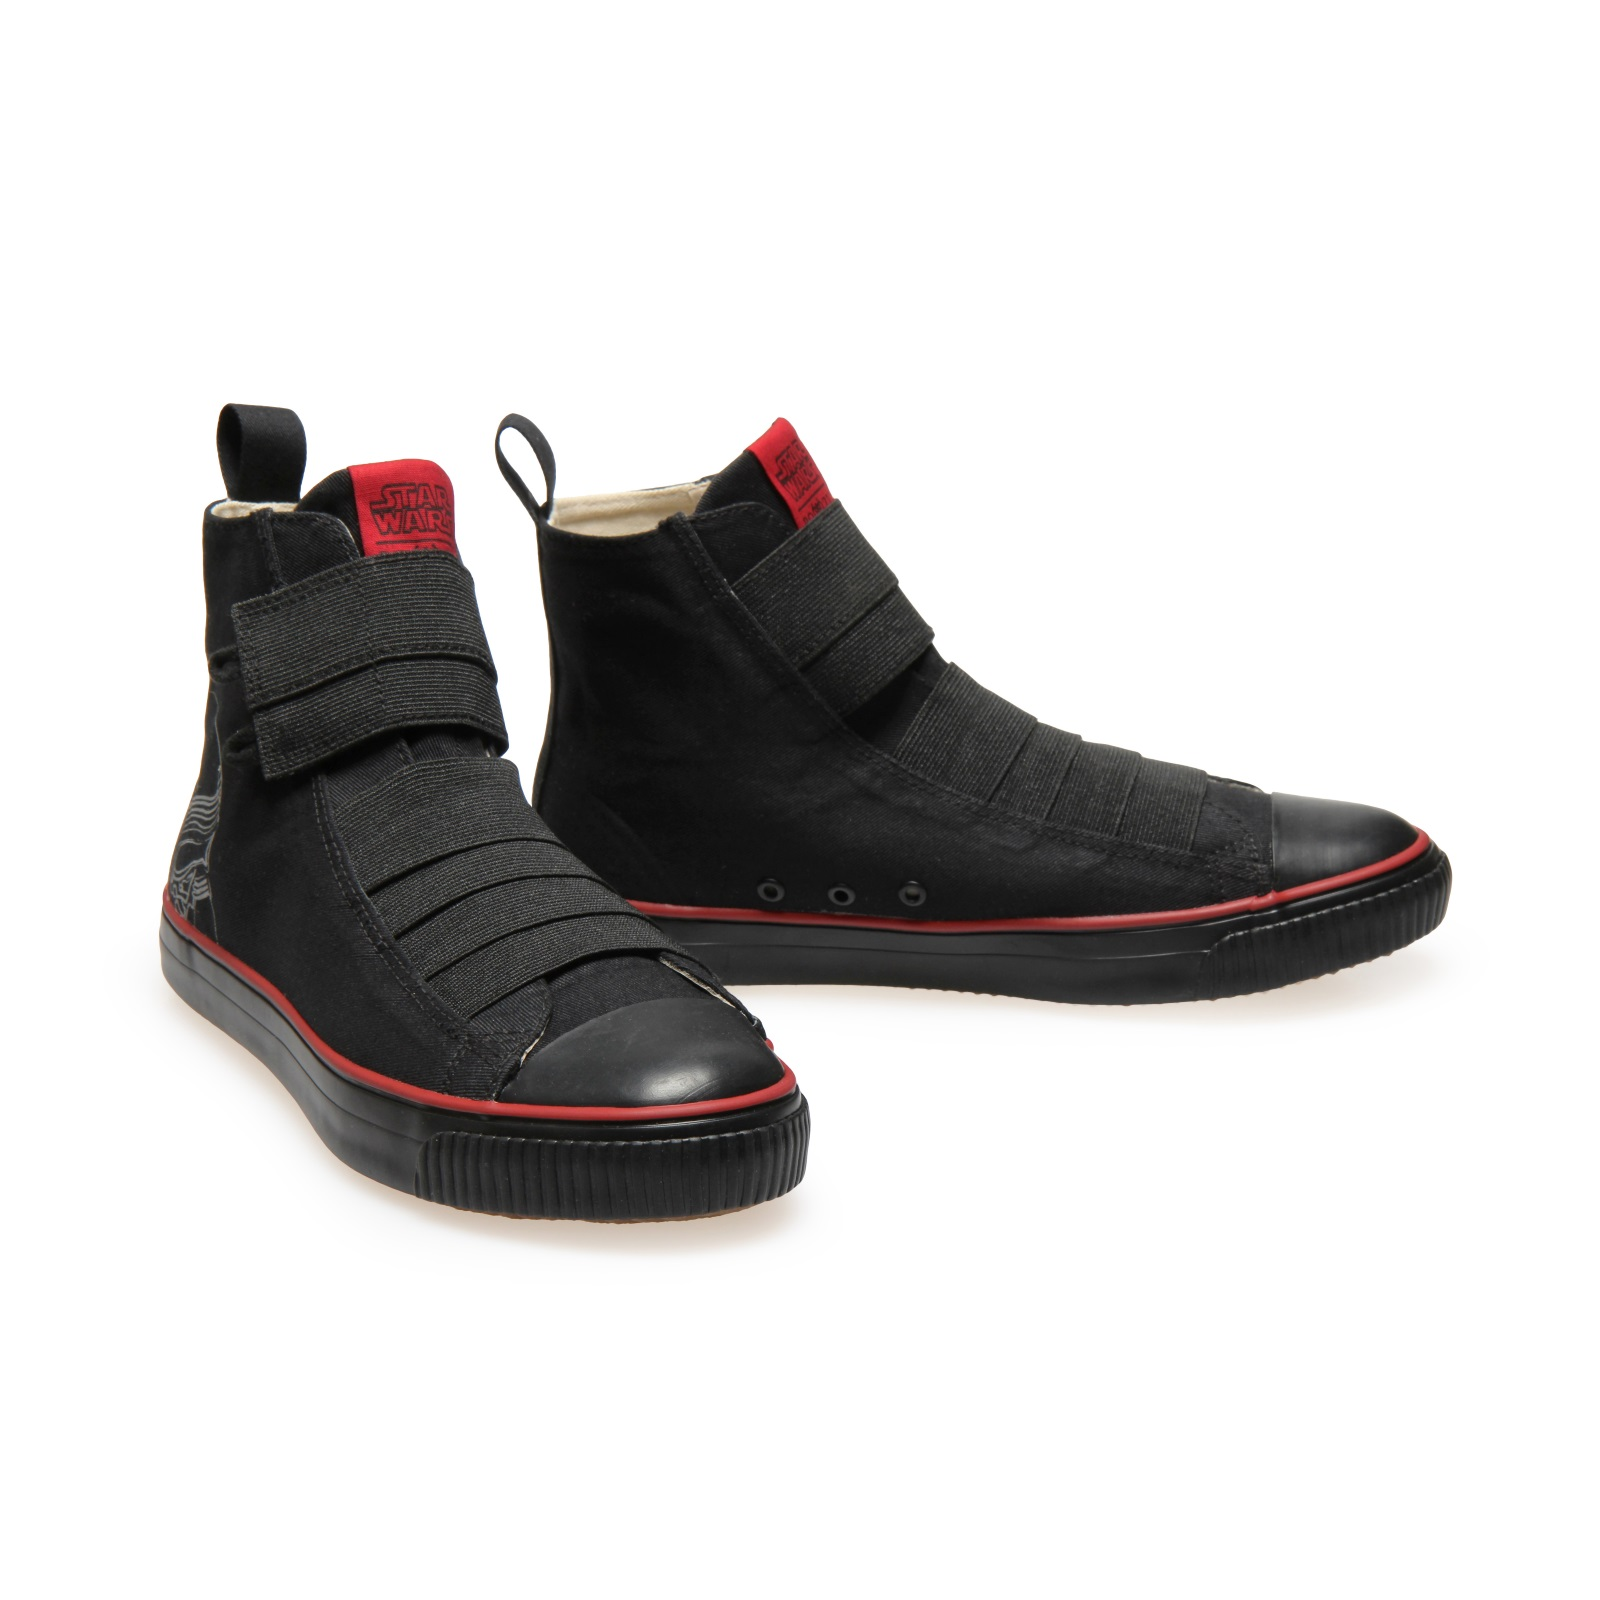 New Po Zu X Star Wars Kylo Ren Sneakers The Kessel Runway